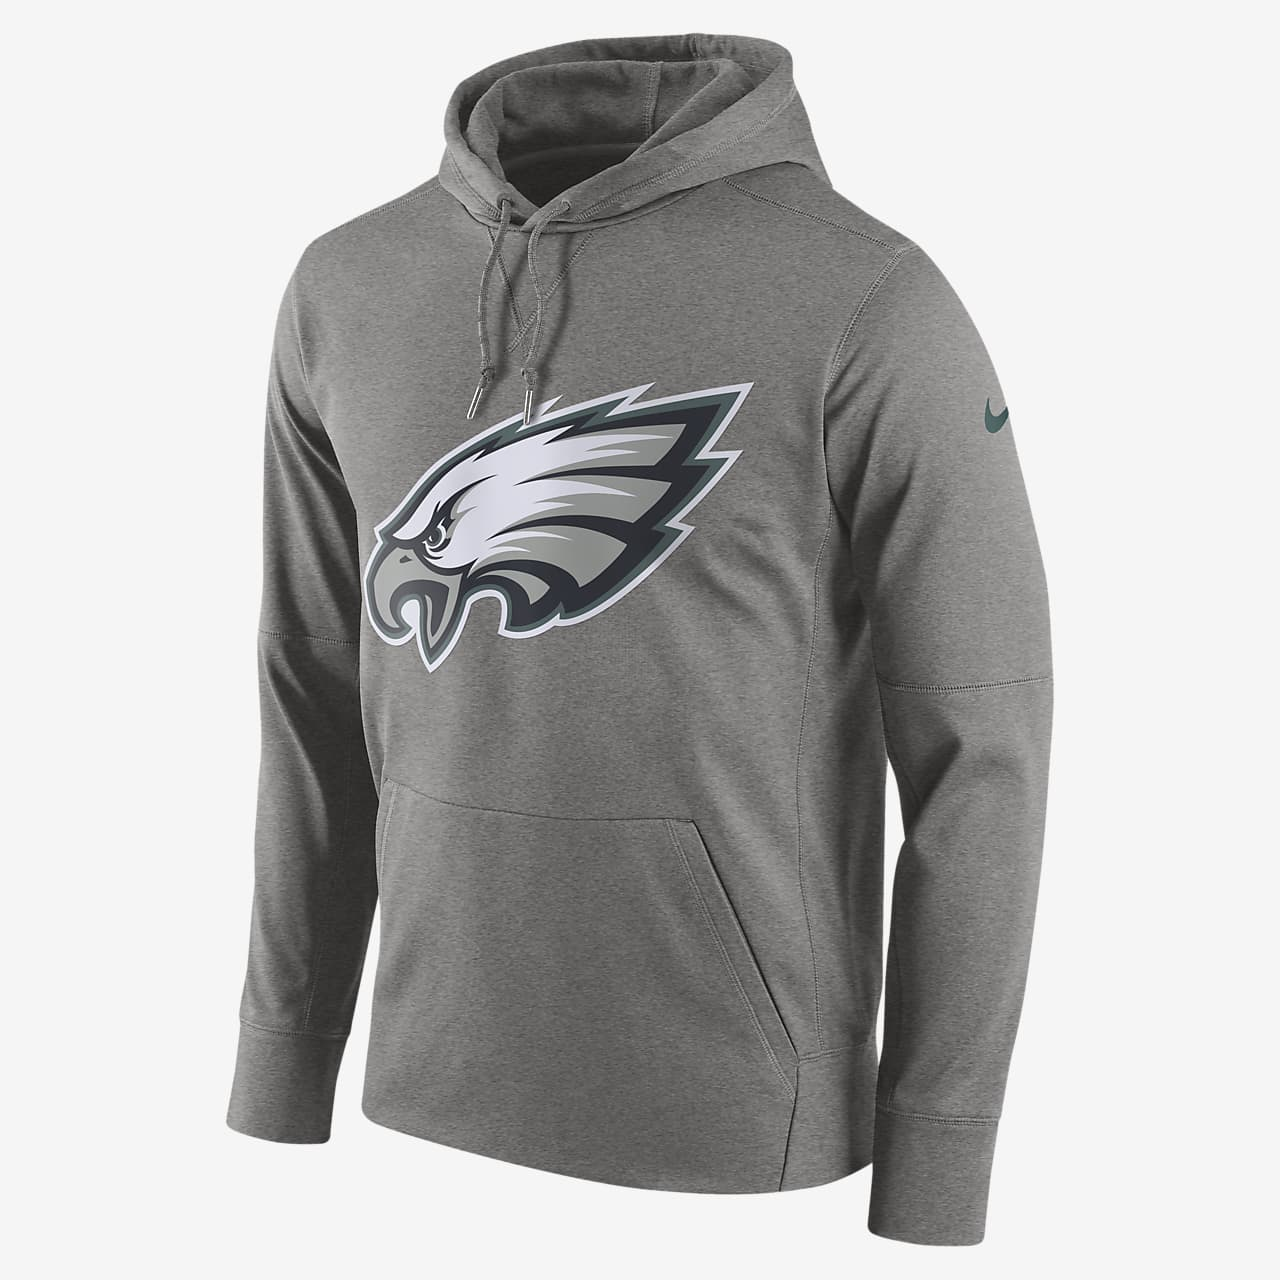 Pánská mikina Nike Circuit Logo Essential (NFL Eagles) s kapucí